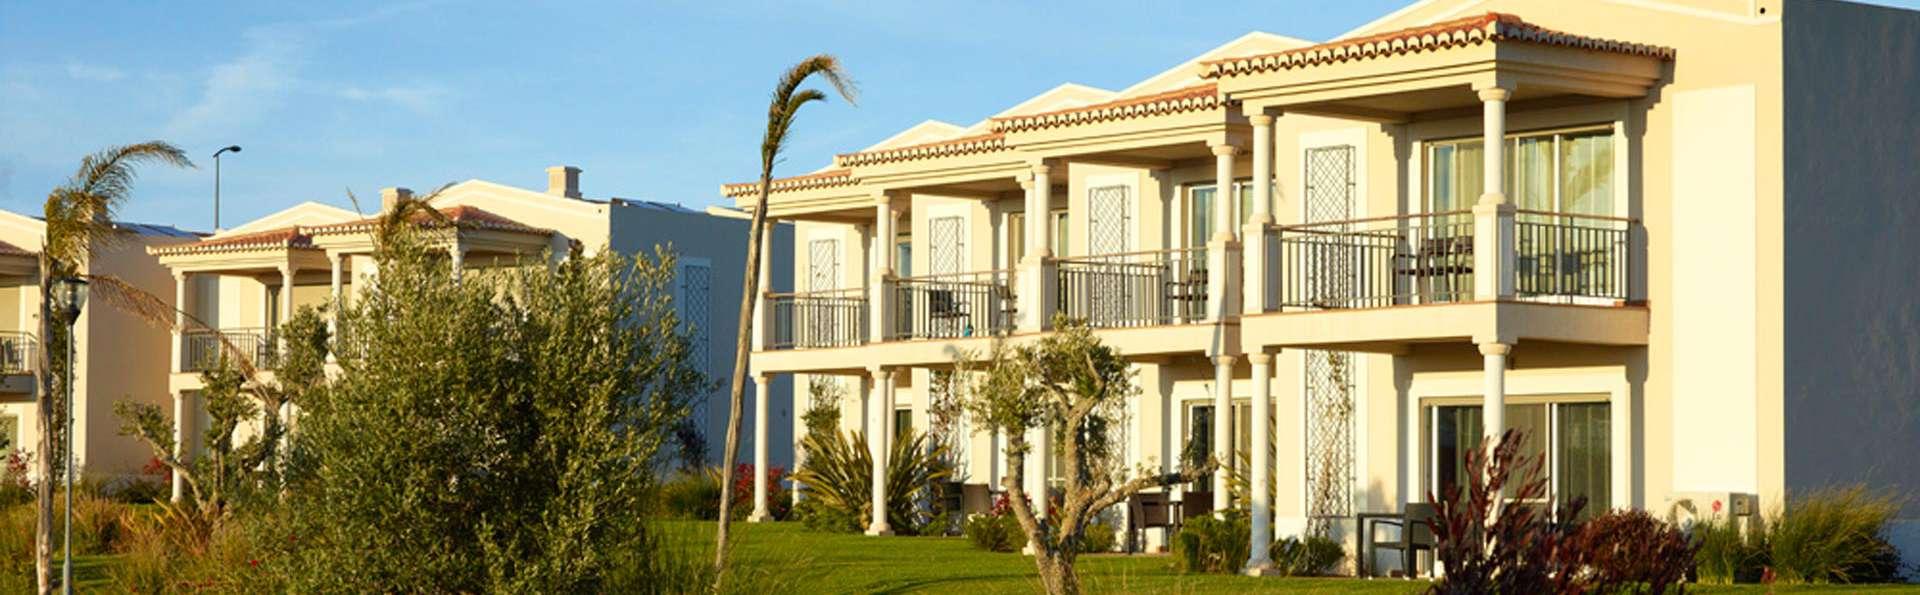 Agua Hotels Vale da Lapa - edit_front_villas323.jpg